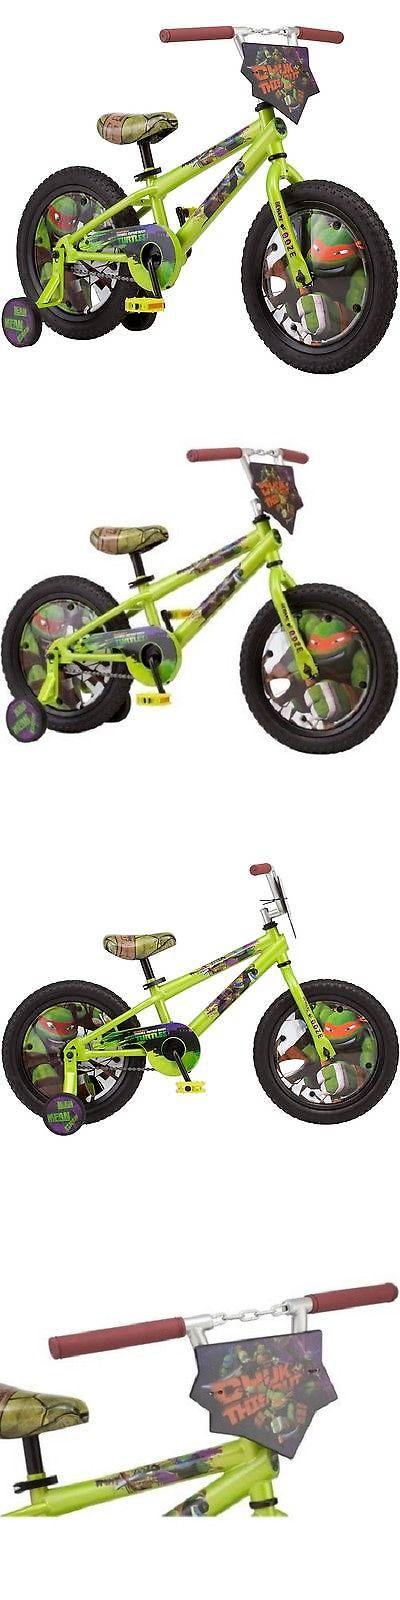 Training Wheels 177839: 16 Boys Tmnt Teenage Mutant Ninja Turtles Bike W/ Training Wheels Ship Free -> BUY IT NOW ONLY: $92.75 on eBay!